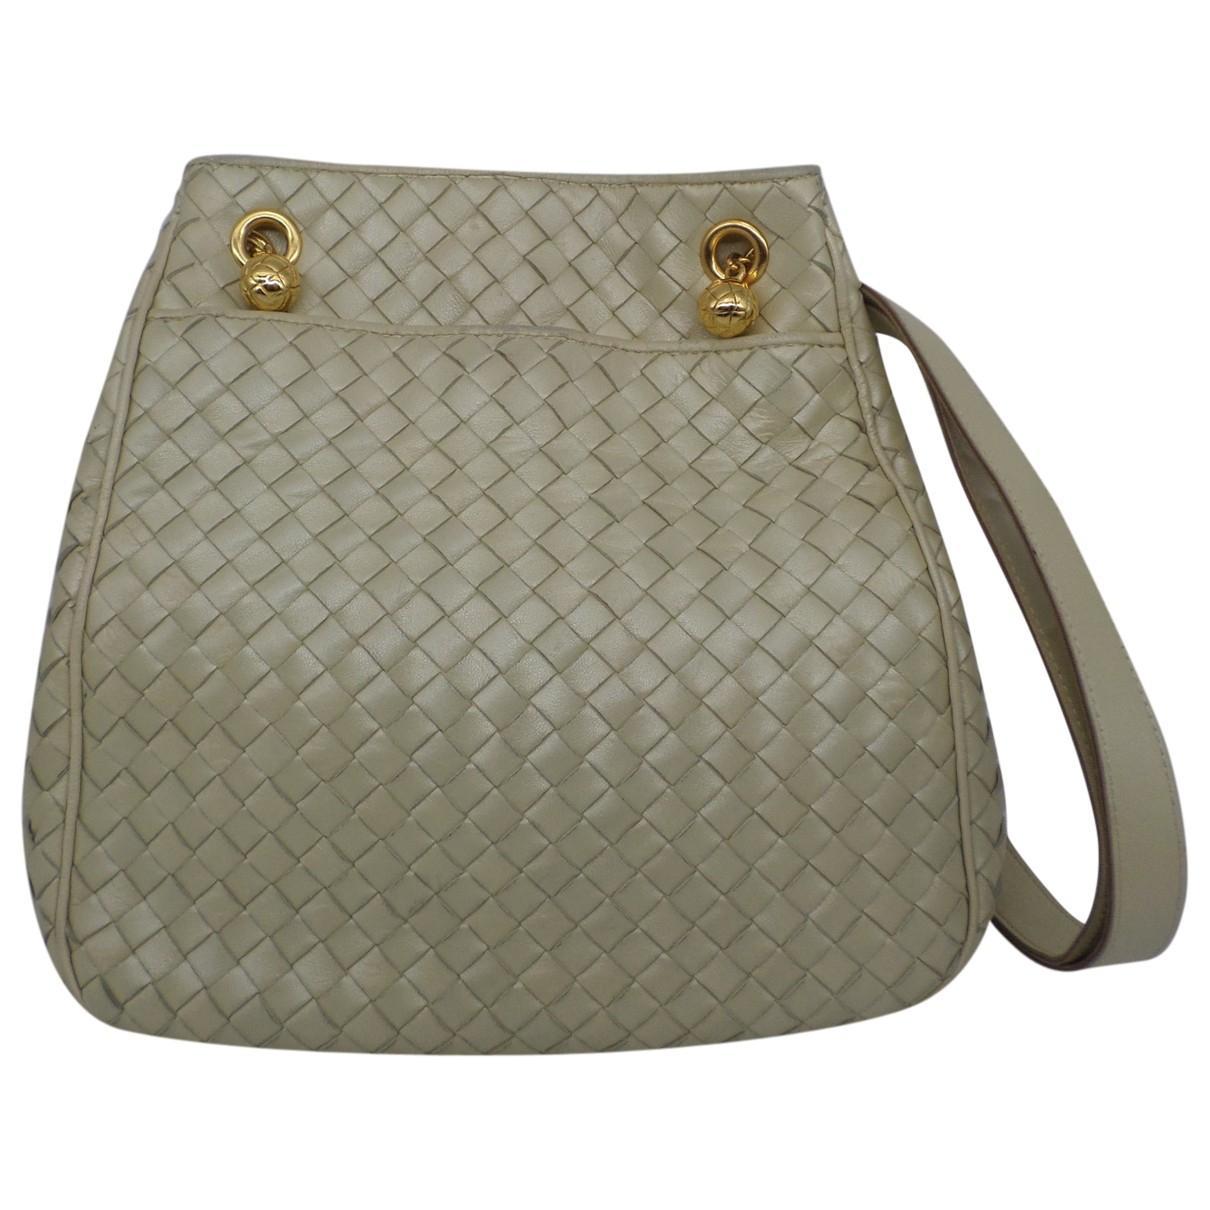 bc8a133ca9 Bottega Veneta Leather Handbag in Natural - Lyst